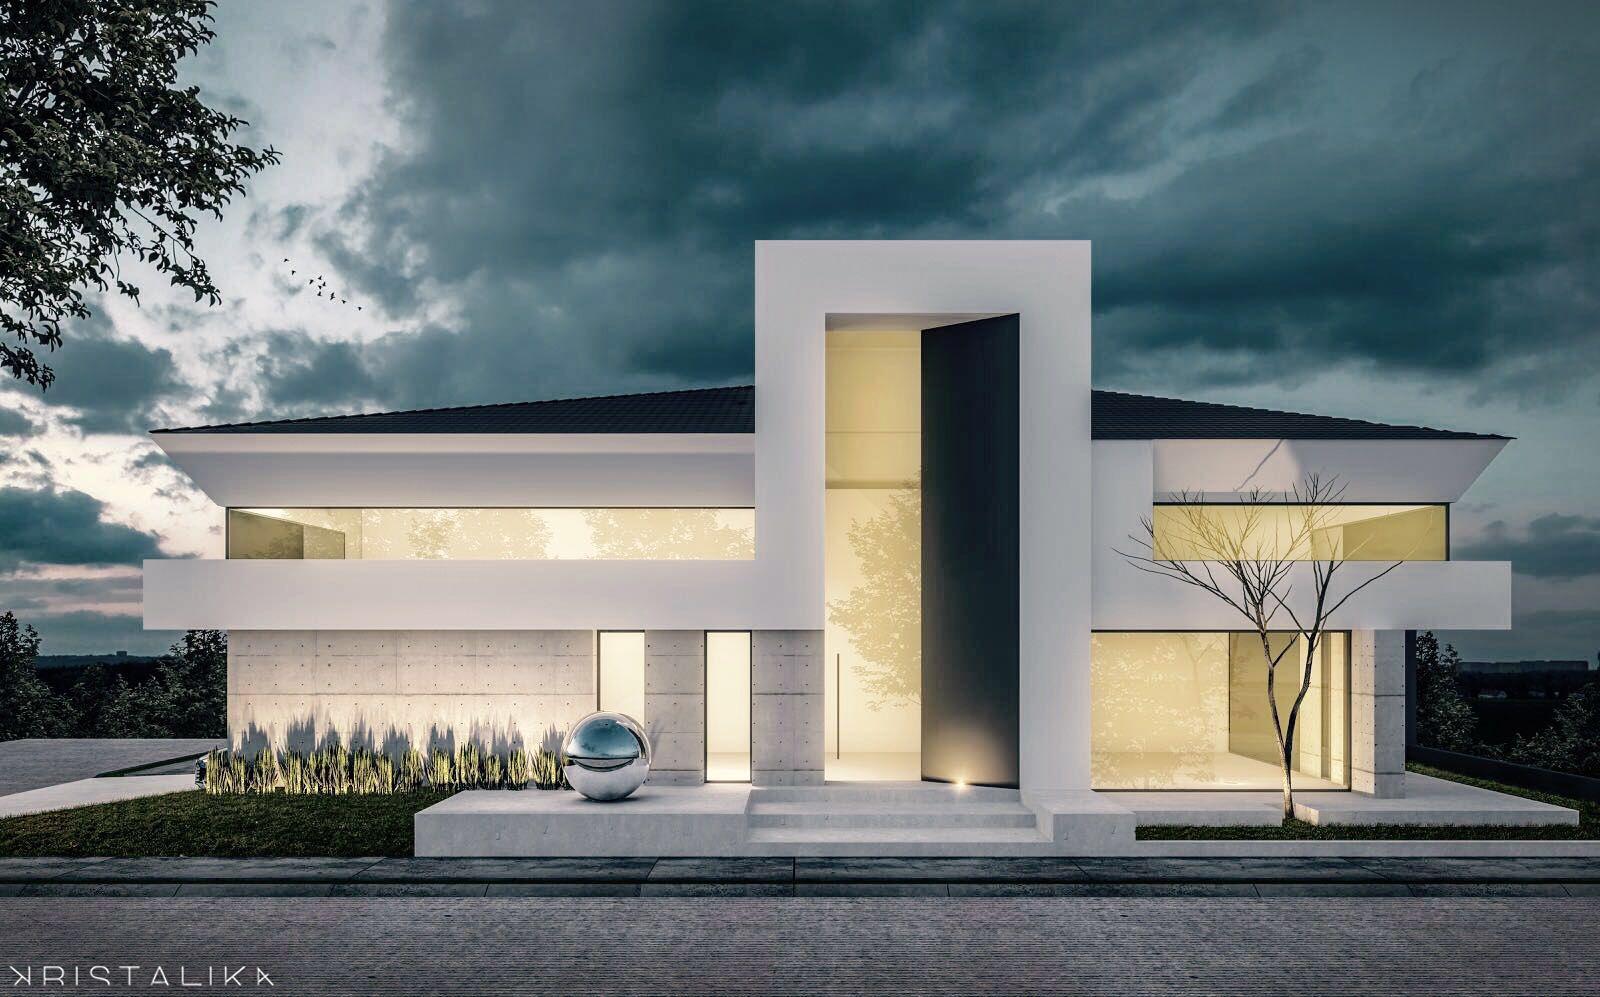 roman house | kristalika arquitecture and interior design, Innenarchitektur ideen